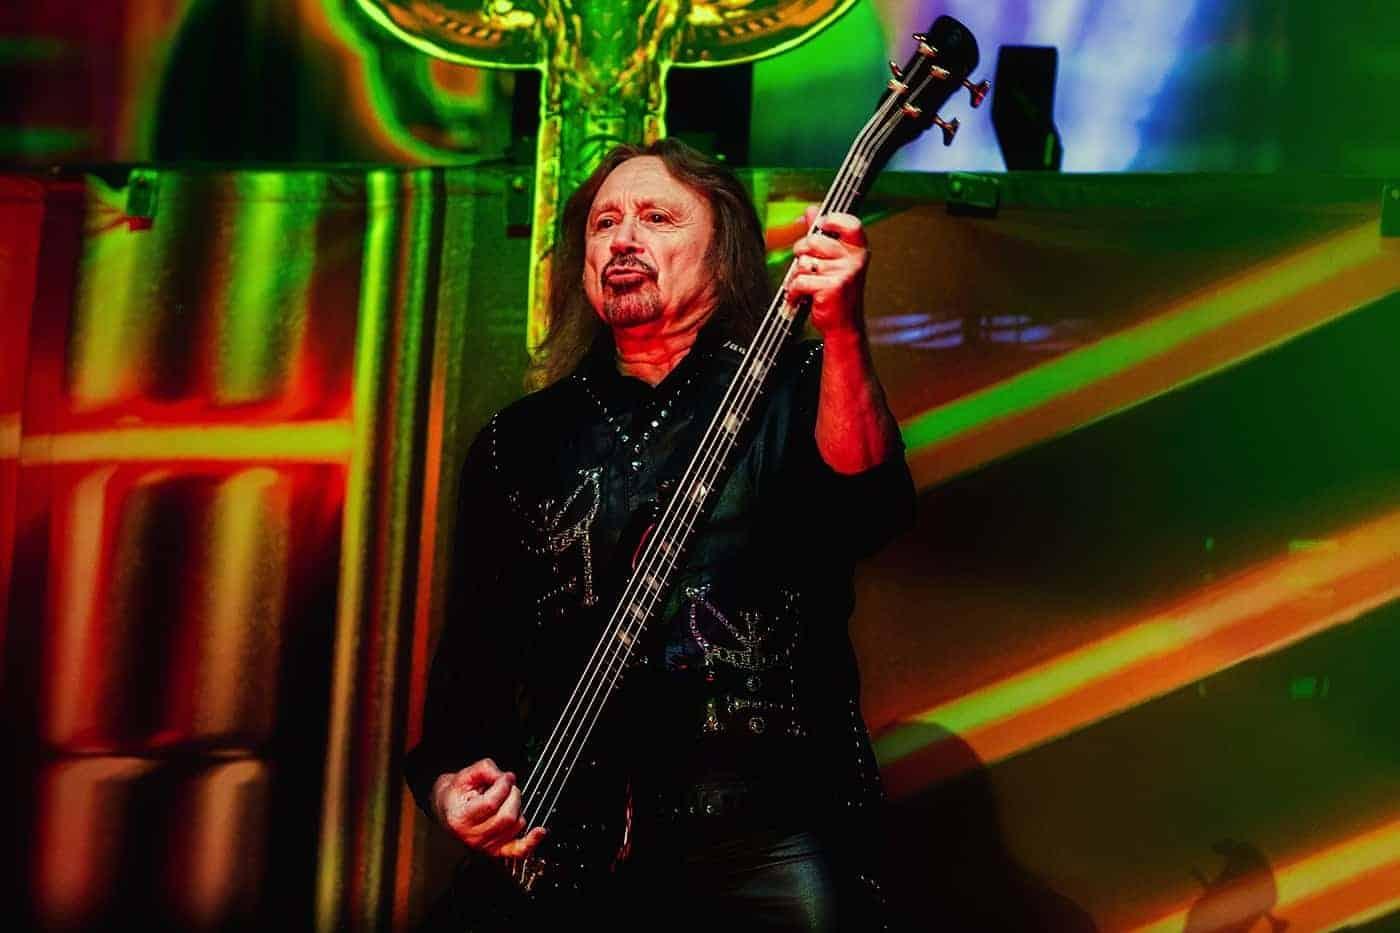 Judas priest bassist Montreal